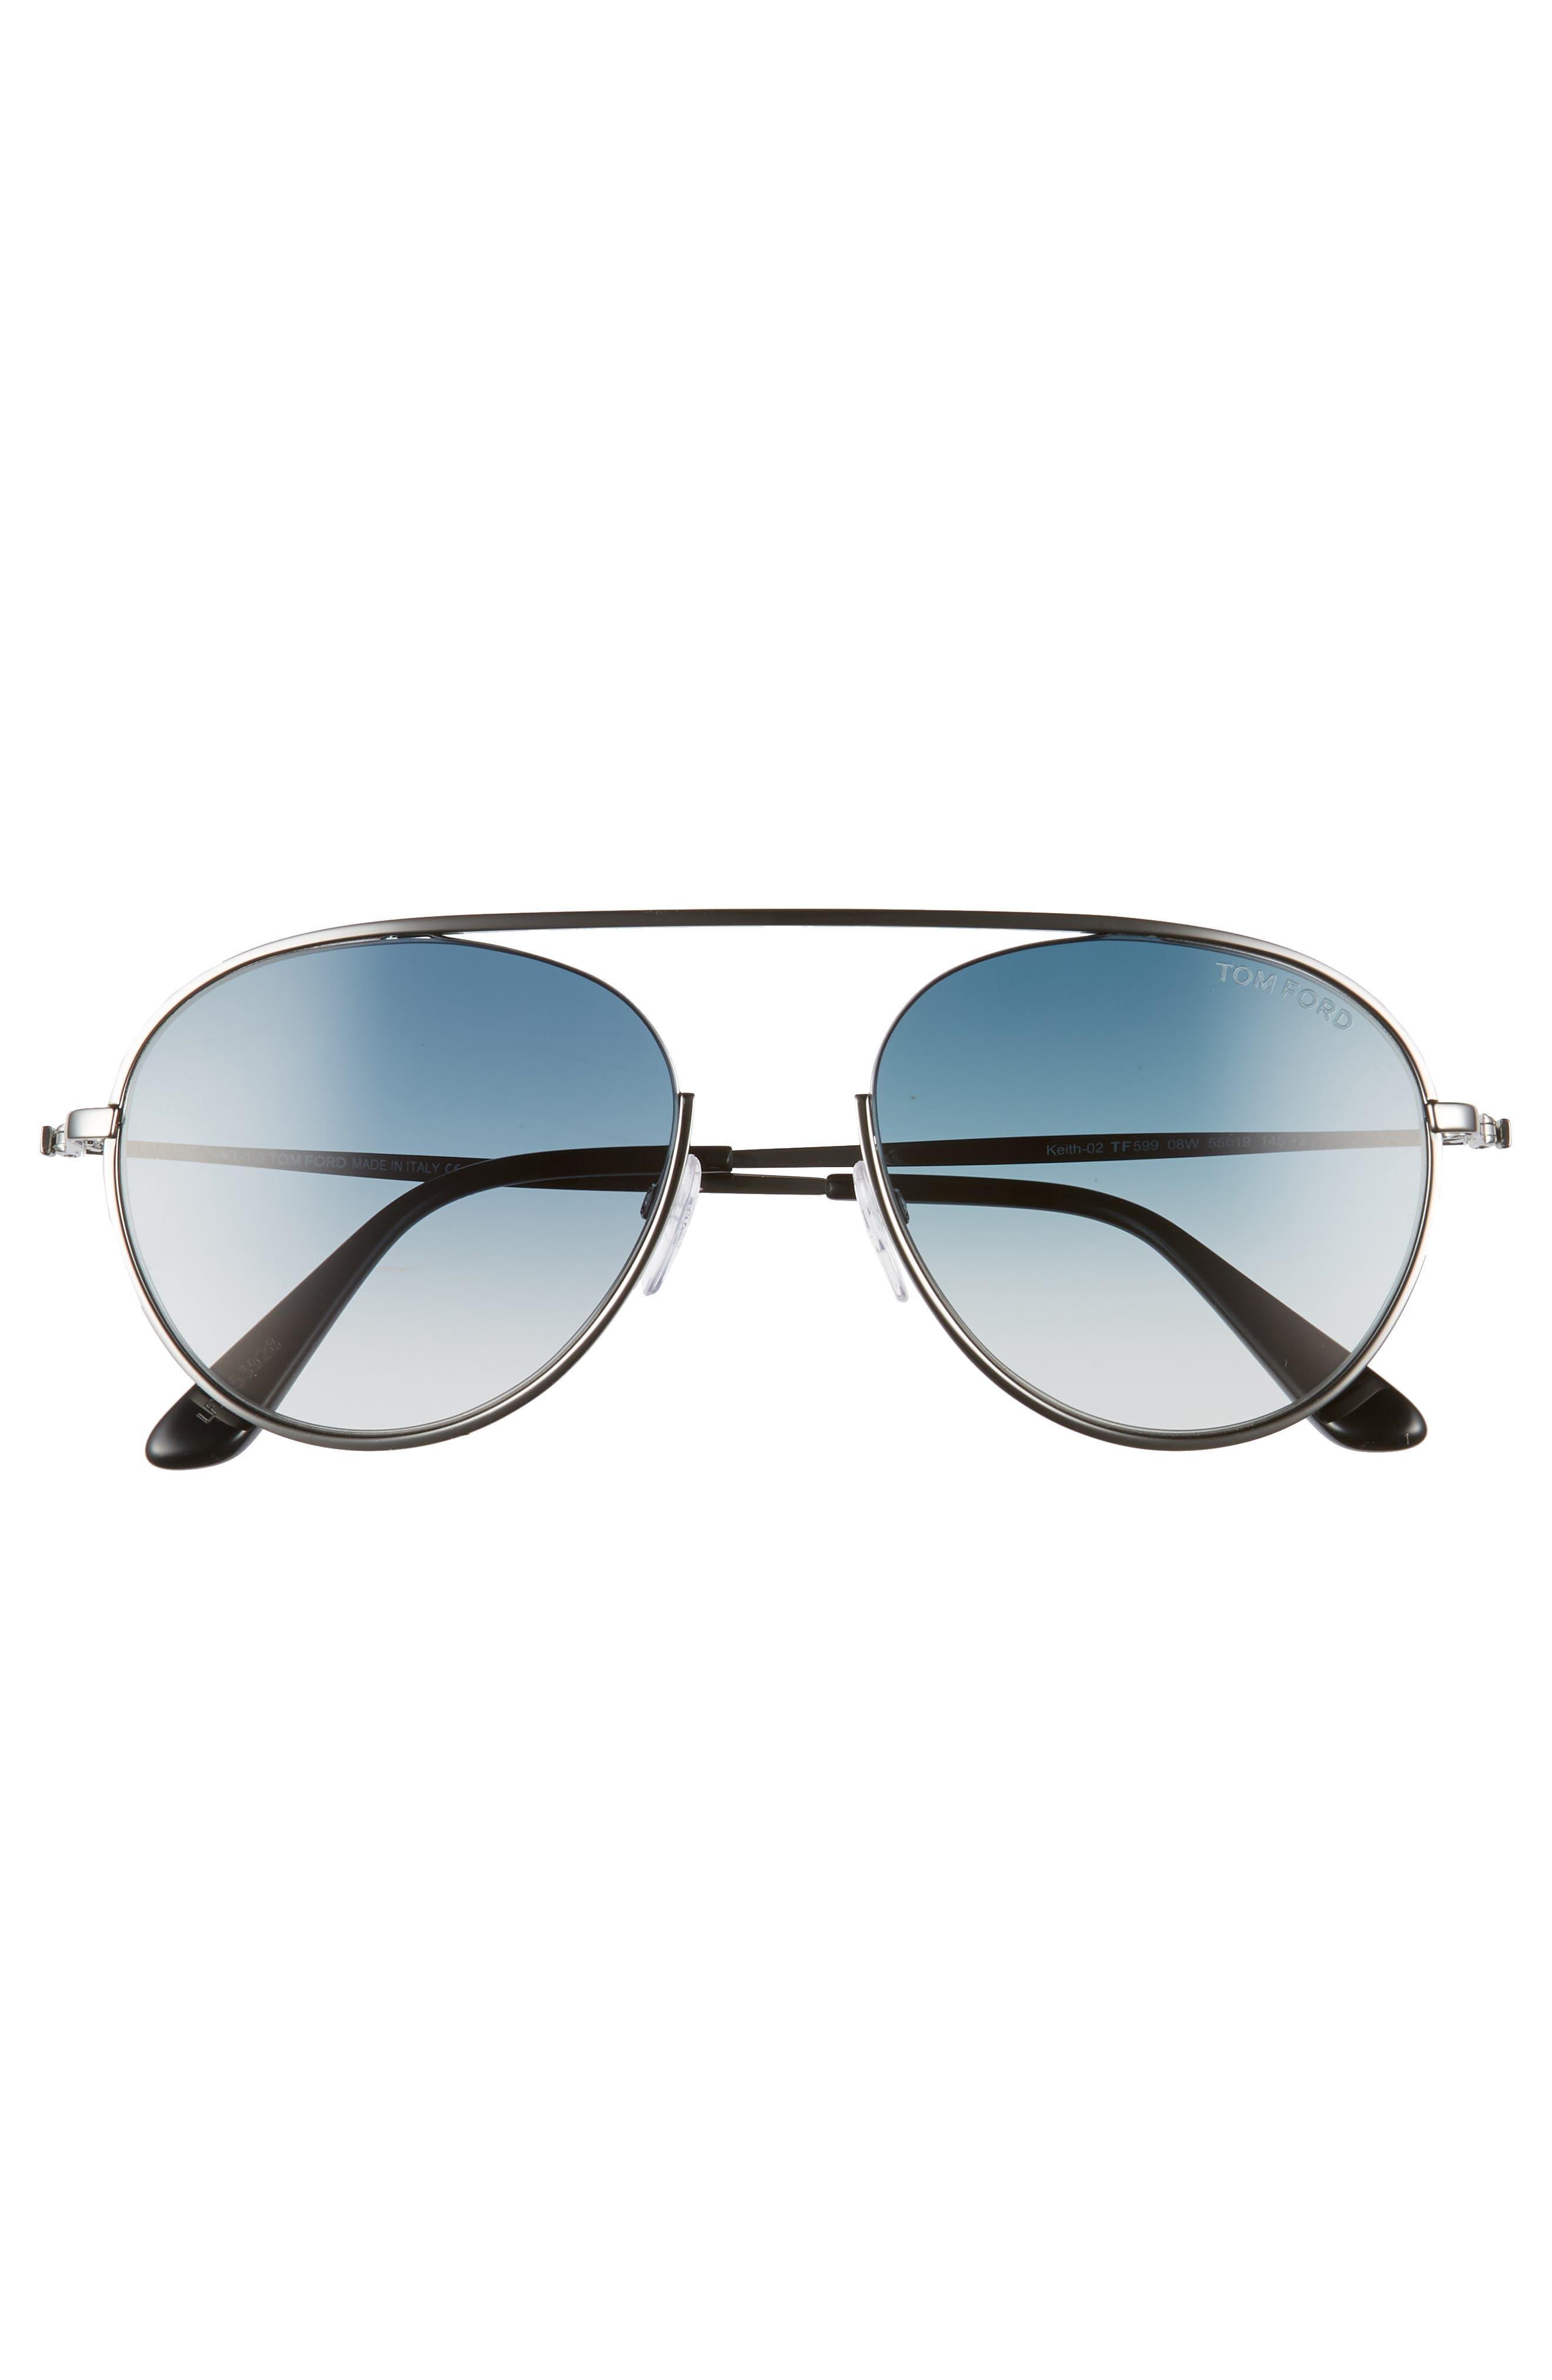 Keith 55mm Metal Aviator Sunglasses,                             Alternate thumbnail 3, color,                             Shiny Gumetal/ Gradient Blue